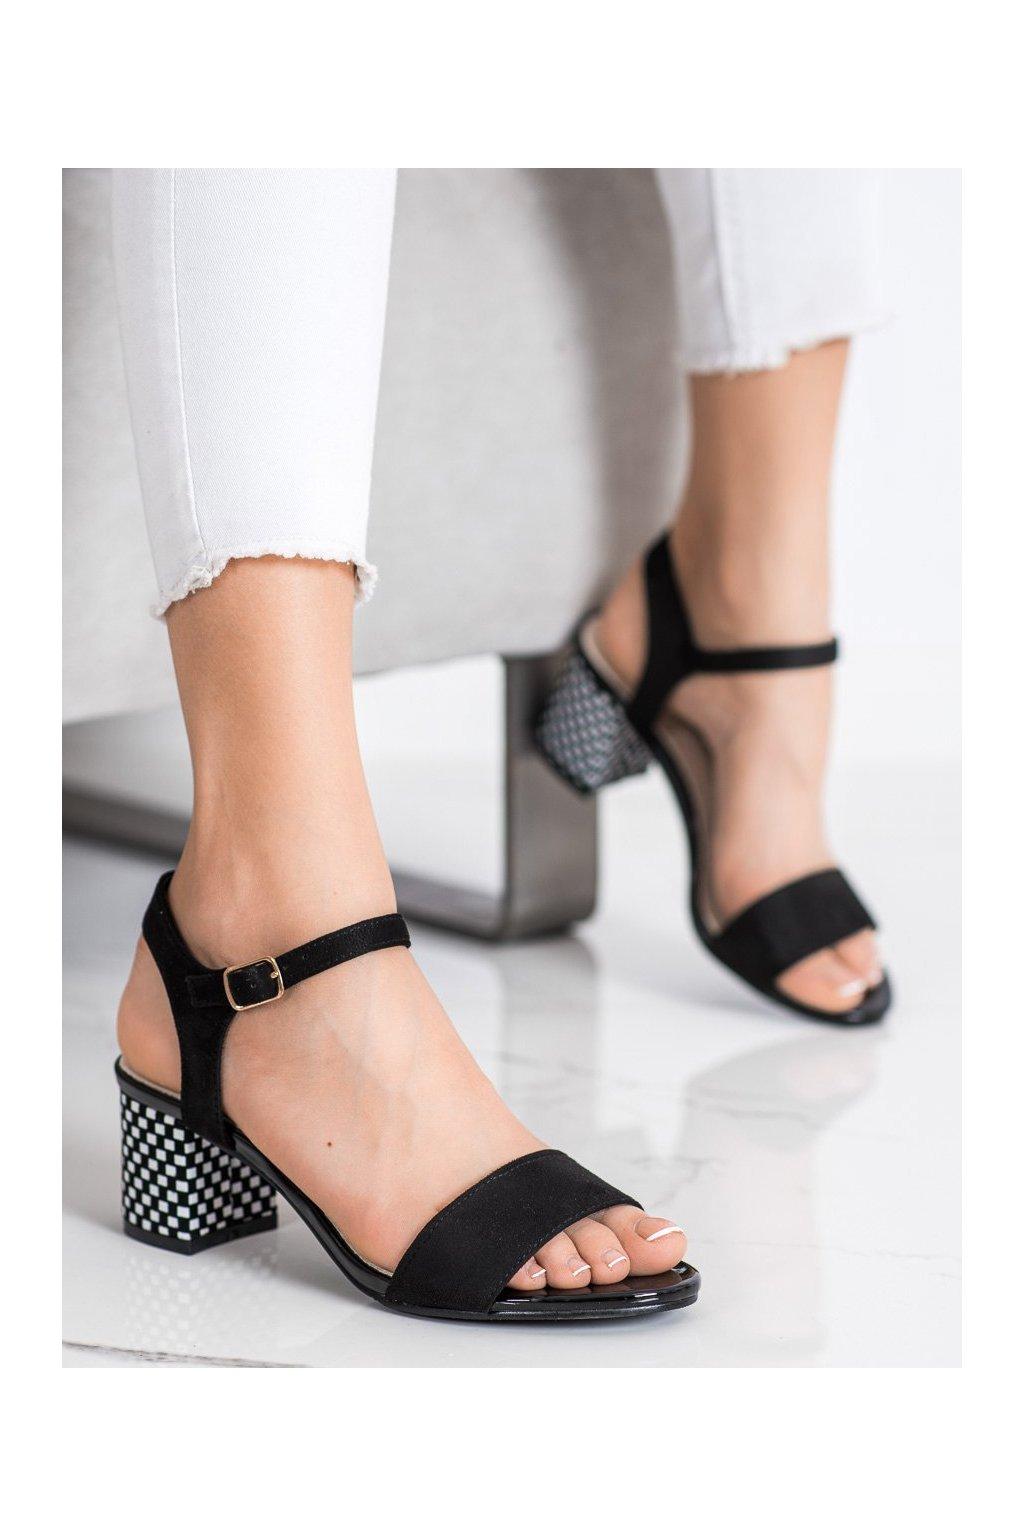 Čierne sandále Goodin kod GD-FL1028B-B